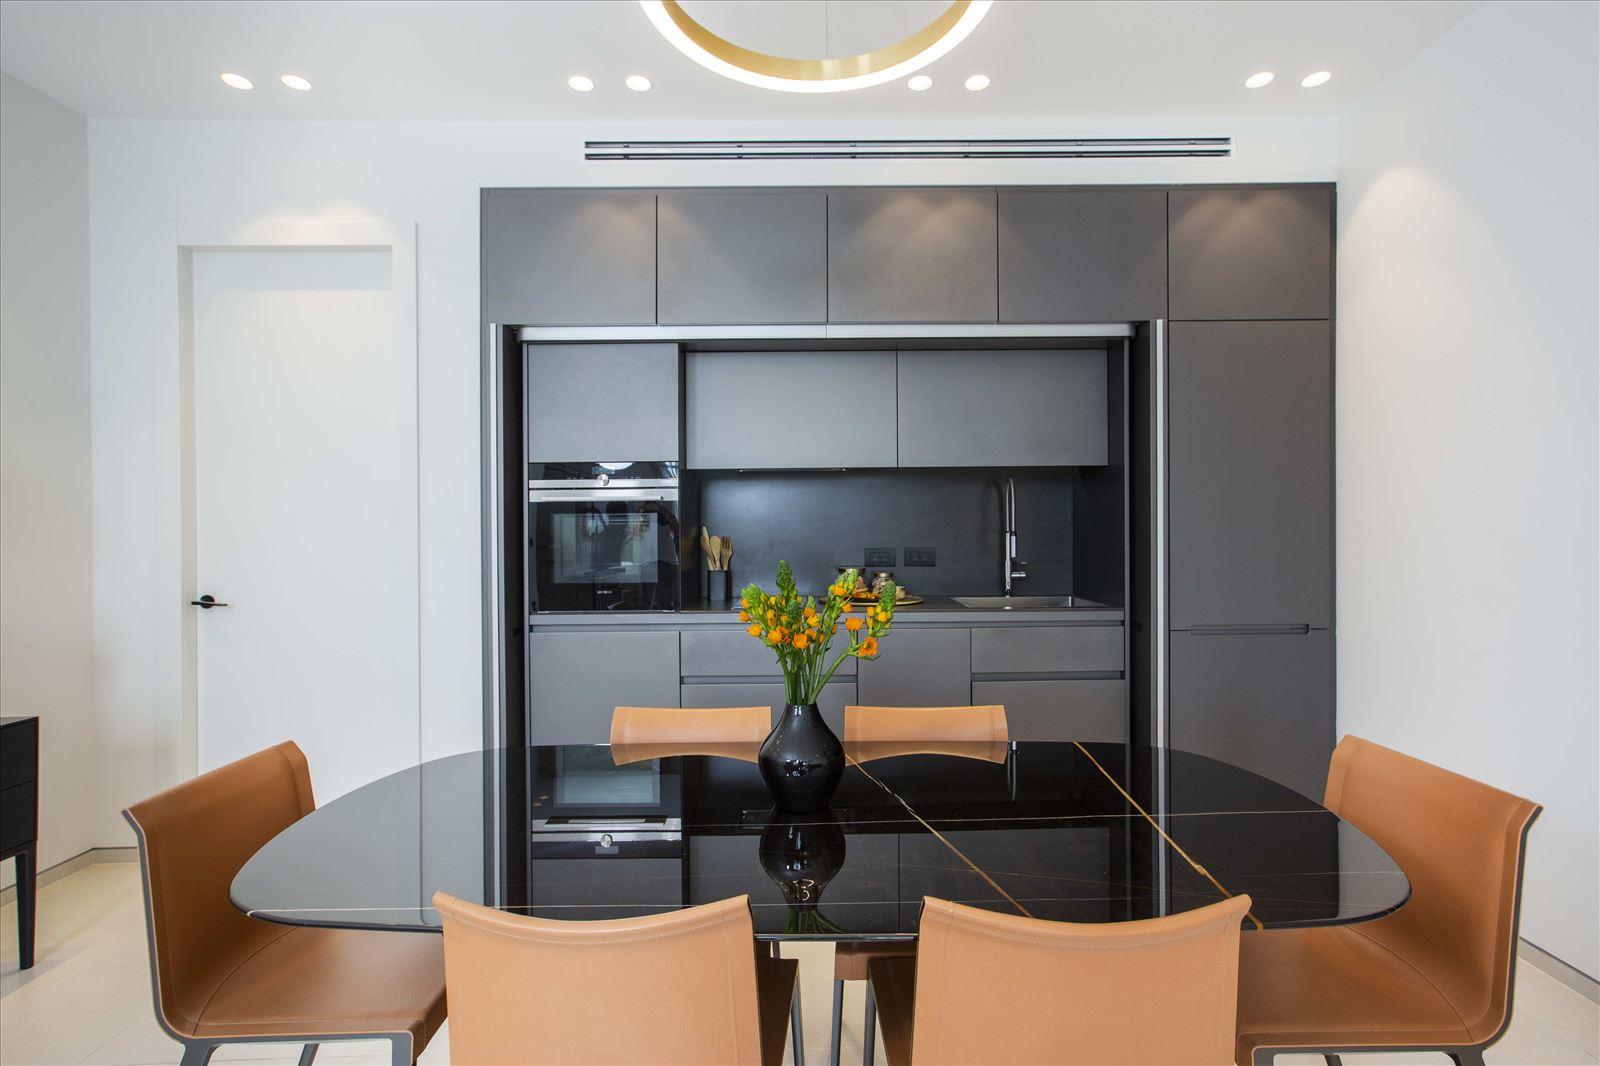 Tel Aviv apartment in Parisian aroma התאורה במטבח נעשתה על ידי קמחי תאורה